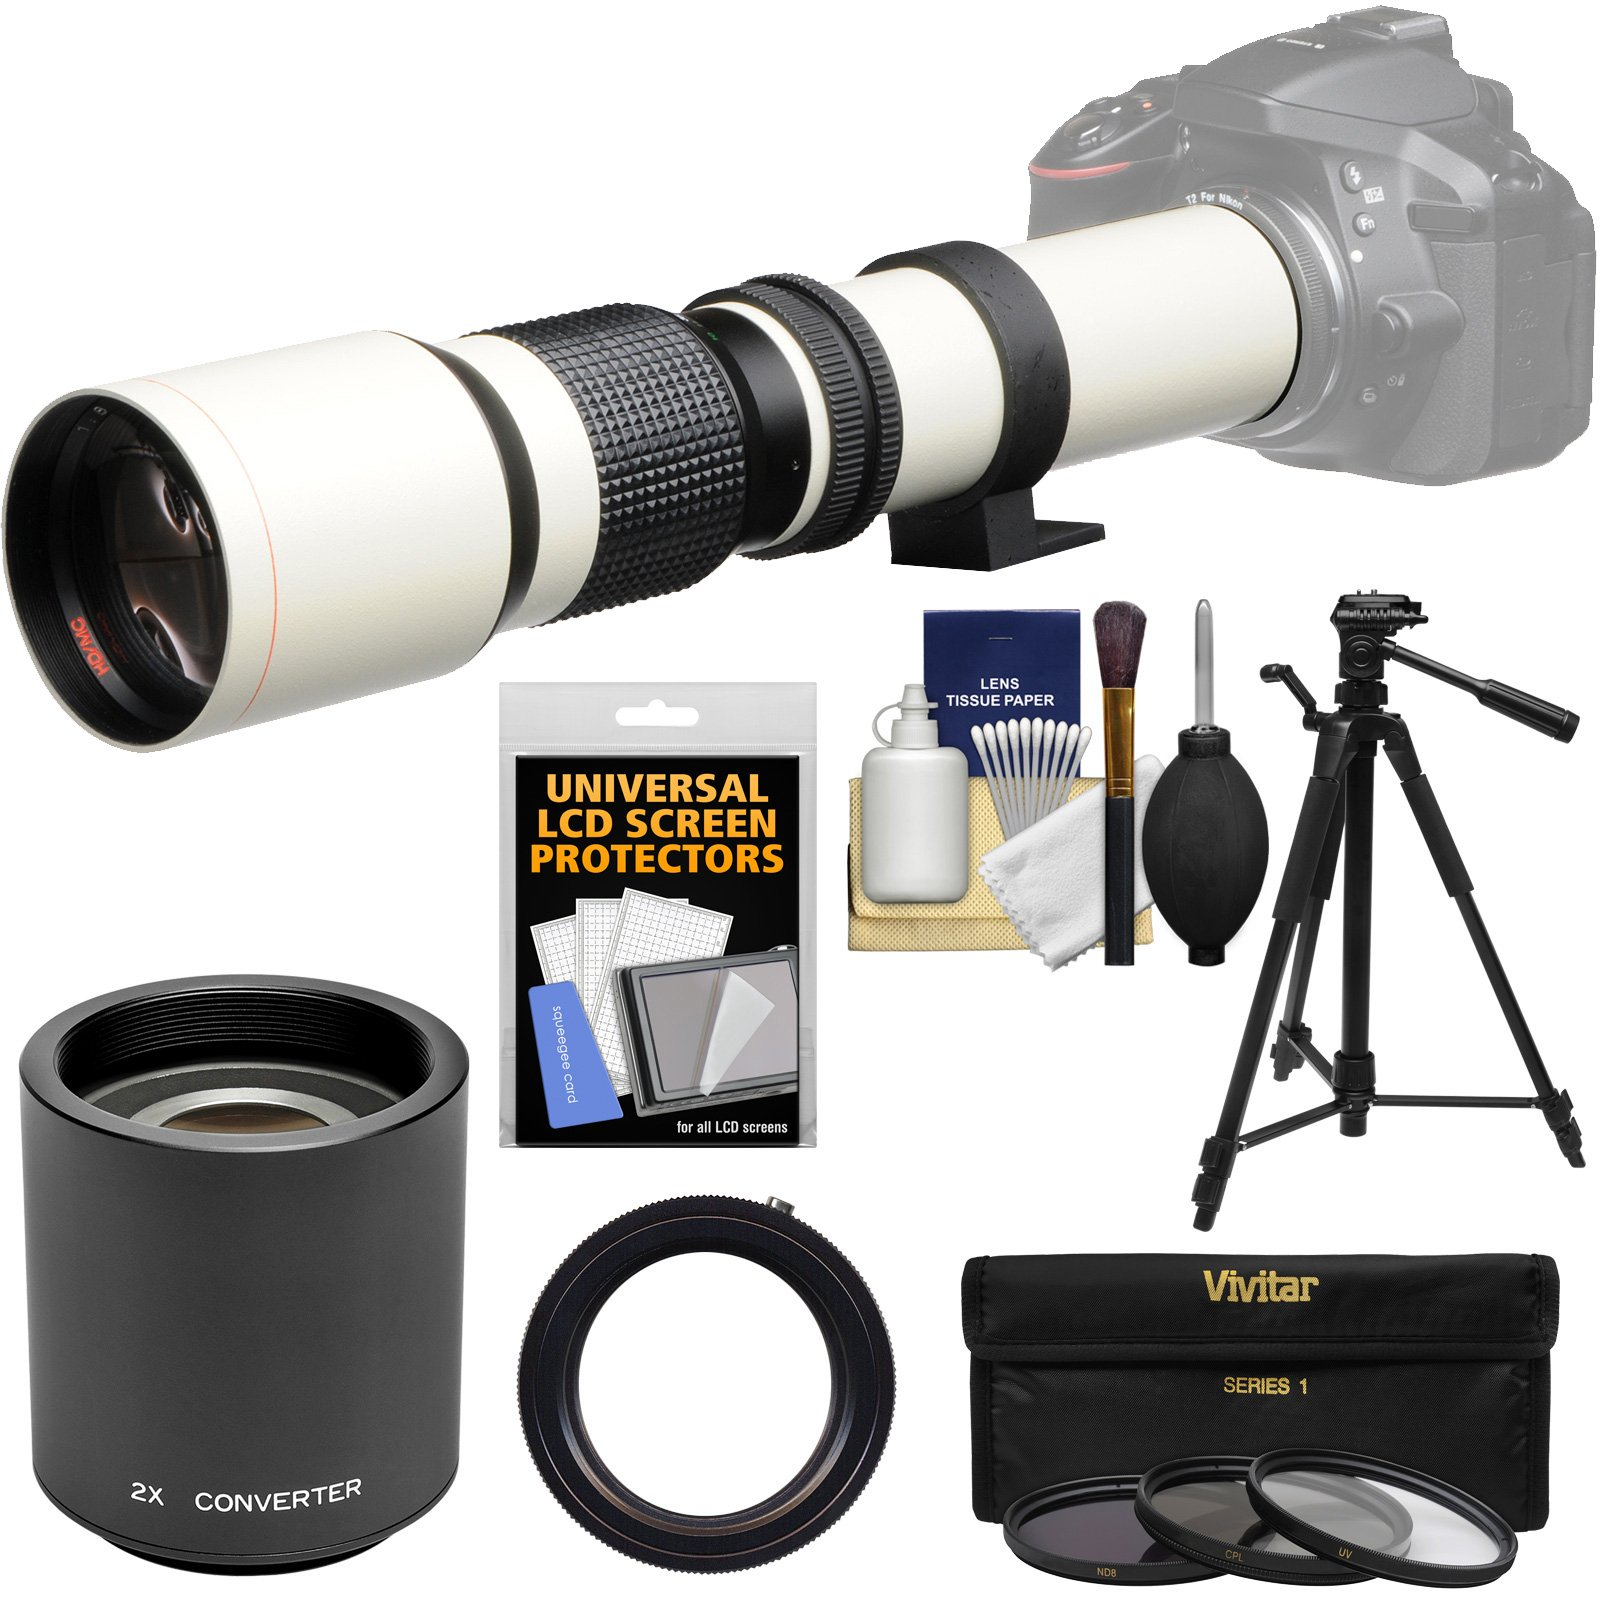 Vivitar 500mm f/8.0 Telephoto Lens (T Mount) (White) with 2X Teleconverter (=1000mm) + Tripod + 3 Filters Kit for Nikon D3200, D3300, D5300, D5500, D7100, D7200, D610, D750, D810 Camera